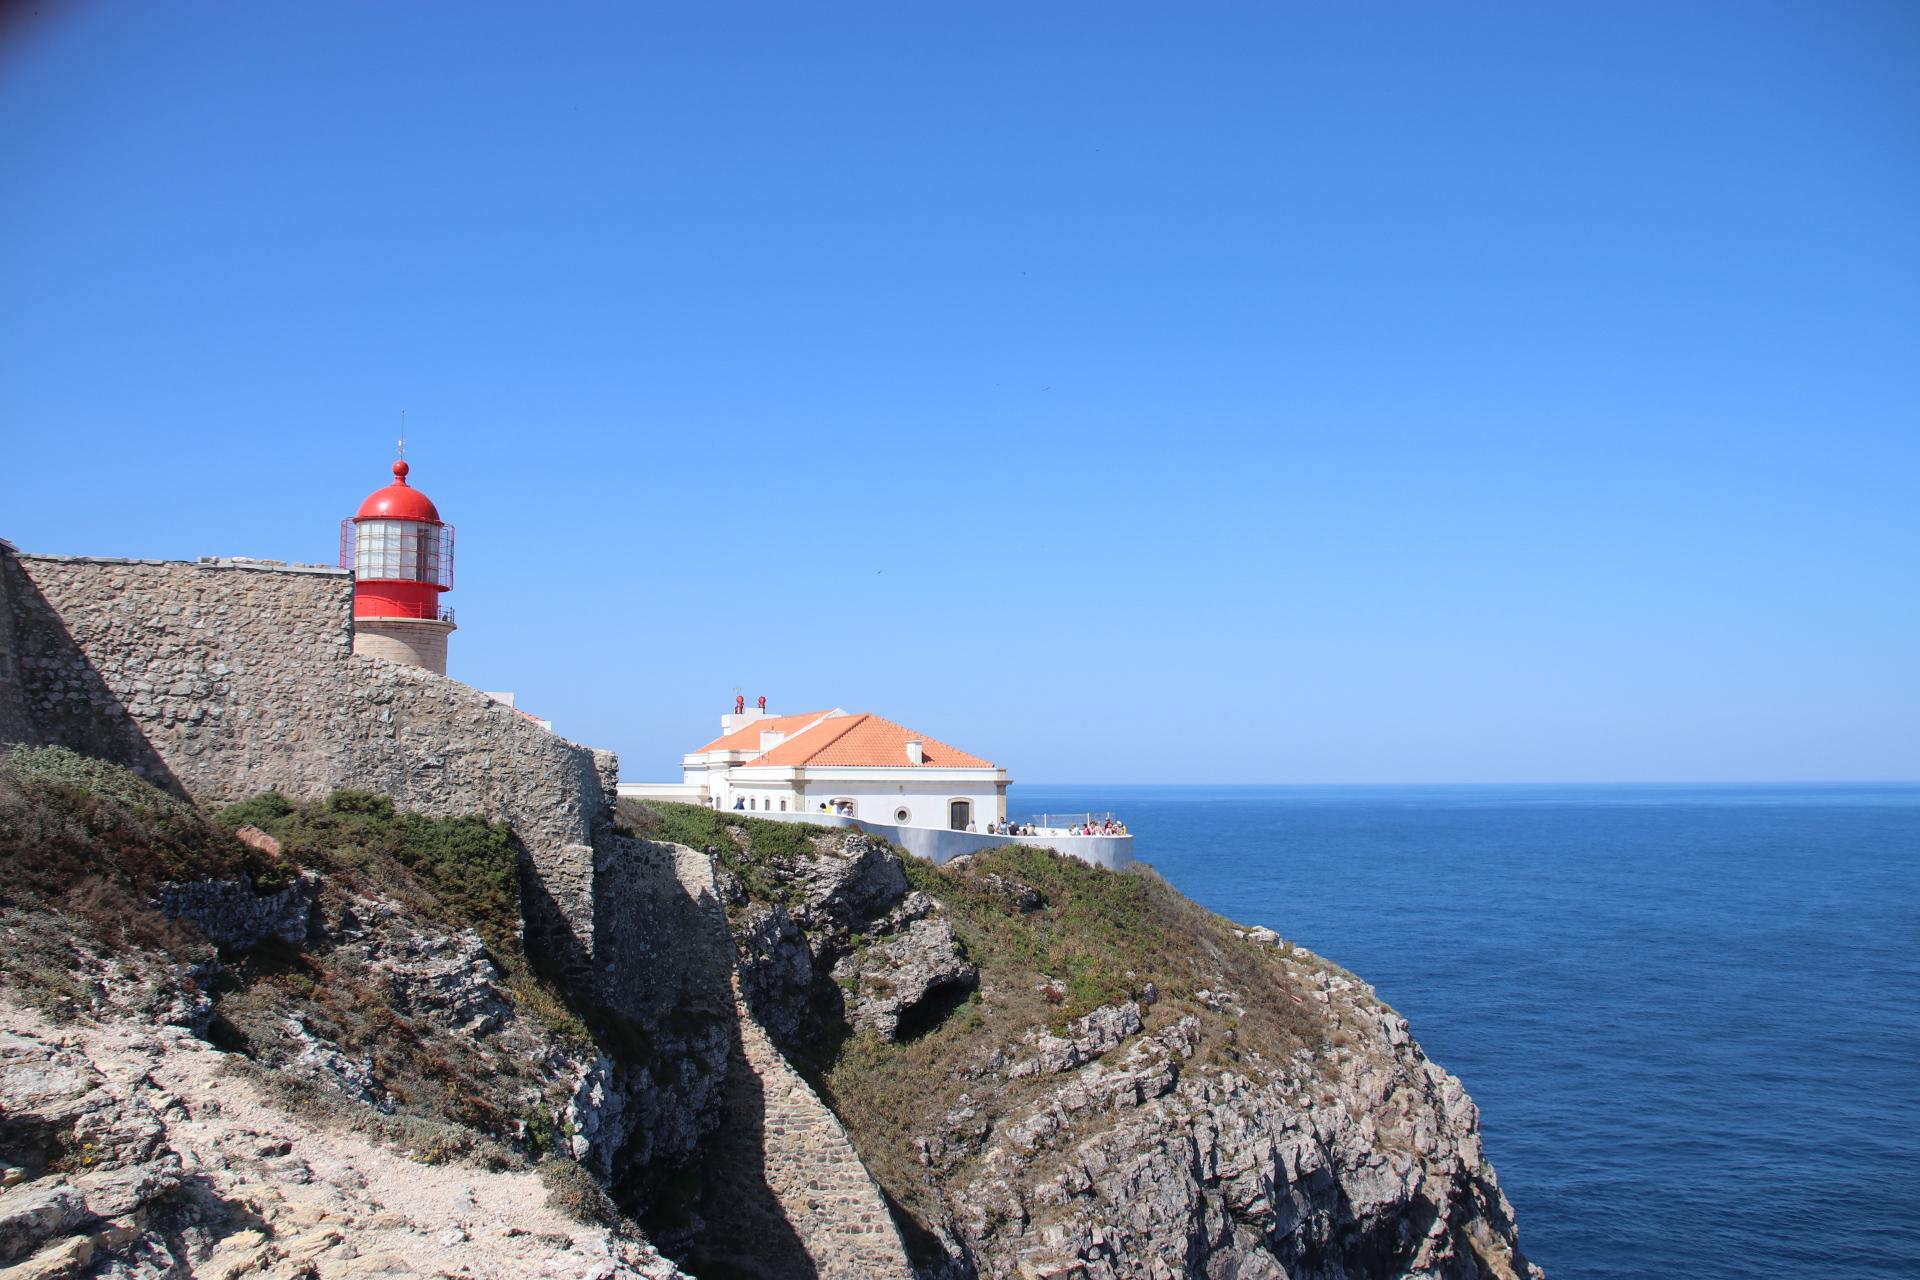 Kap Saint Vincent - Algarve - Der südlichste Punkt Europas